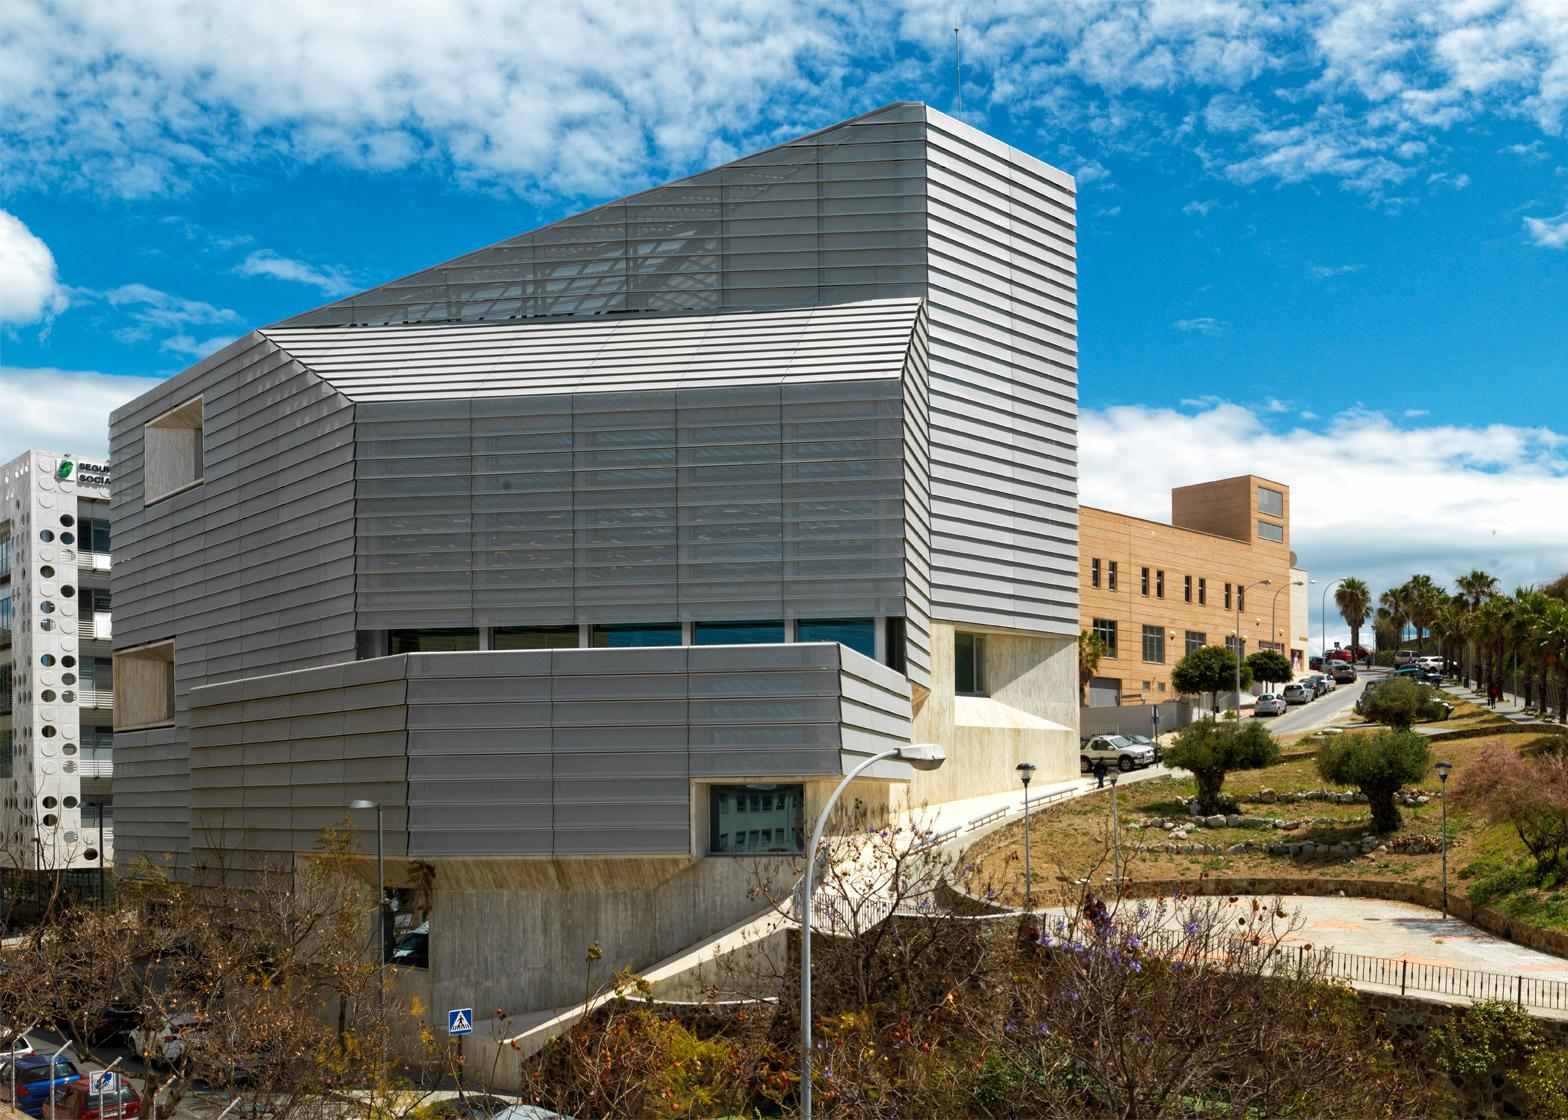 Ceuta Public Library, Ceuta, Spain; by Paredes Pedrosa Arquitectos